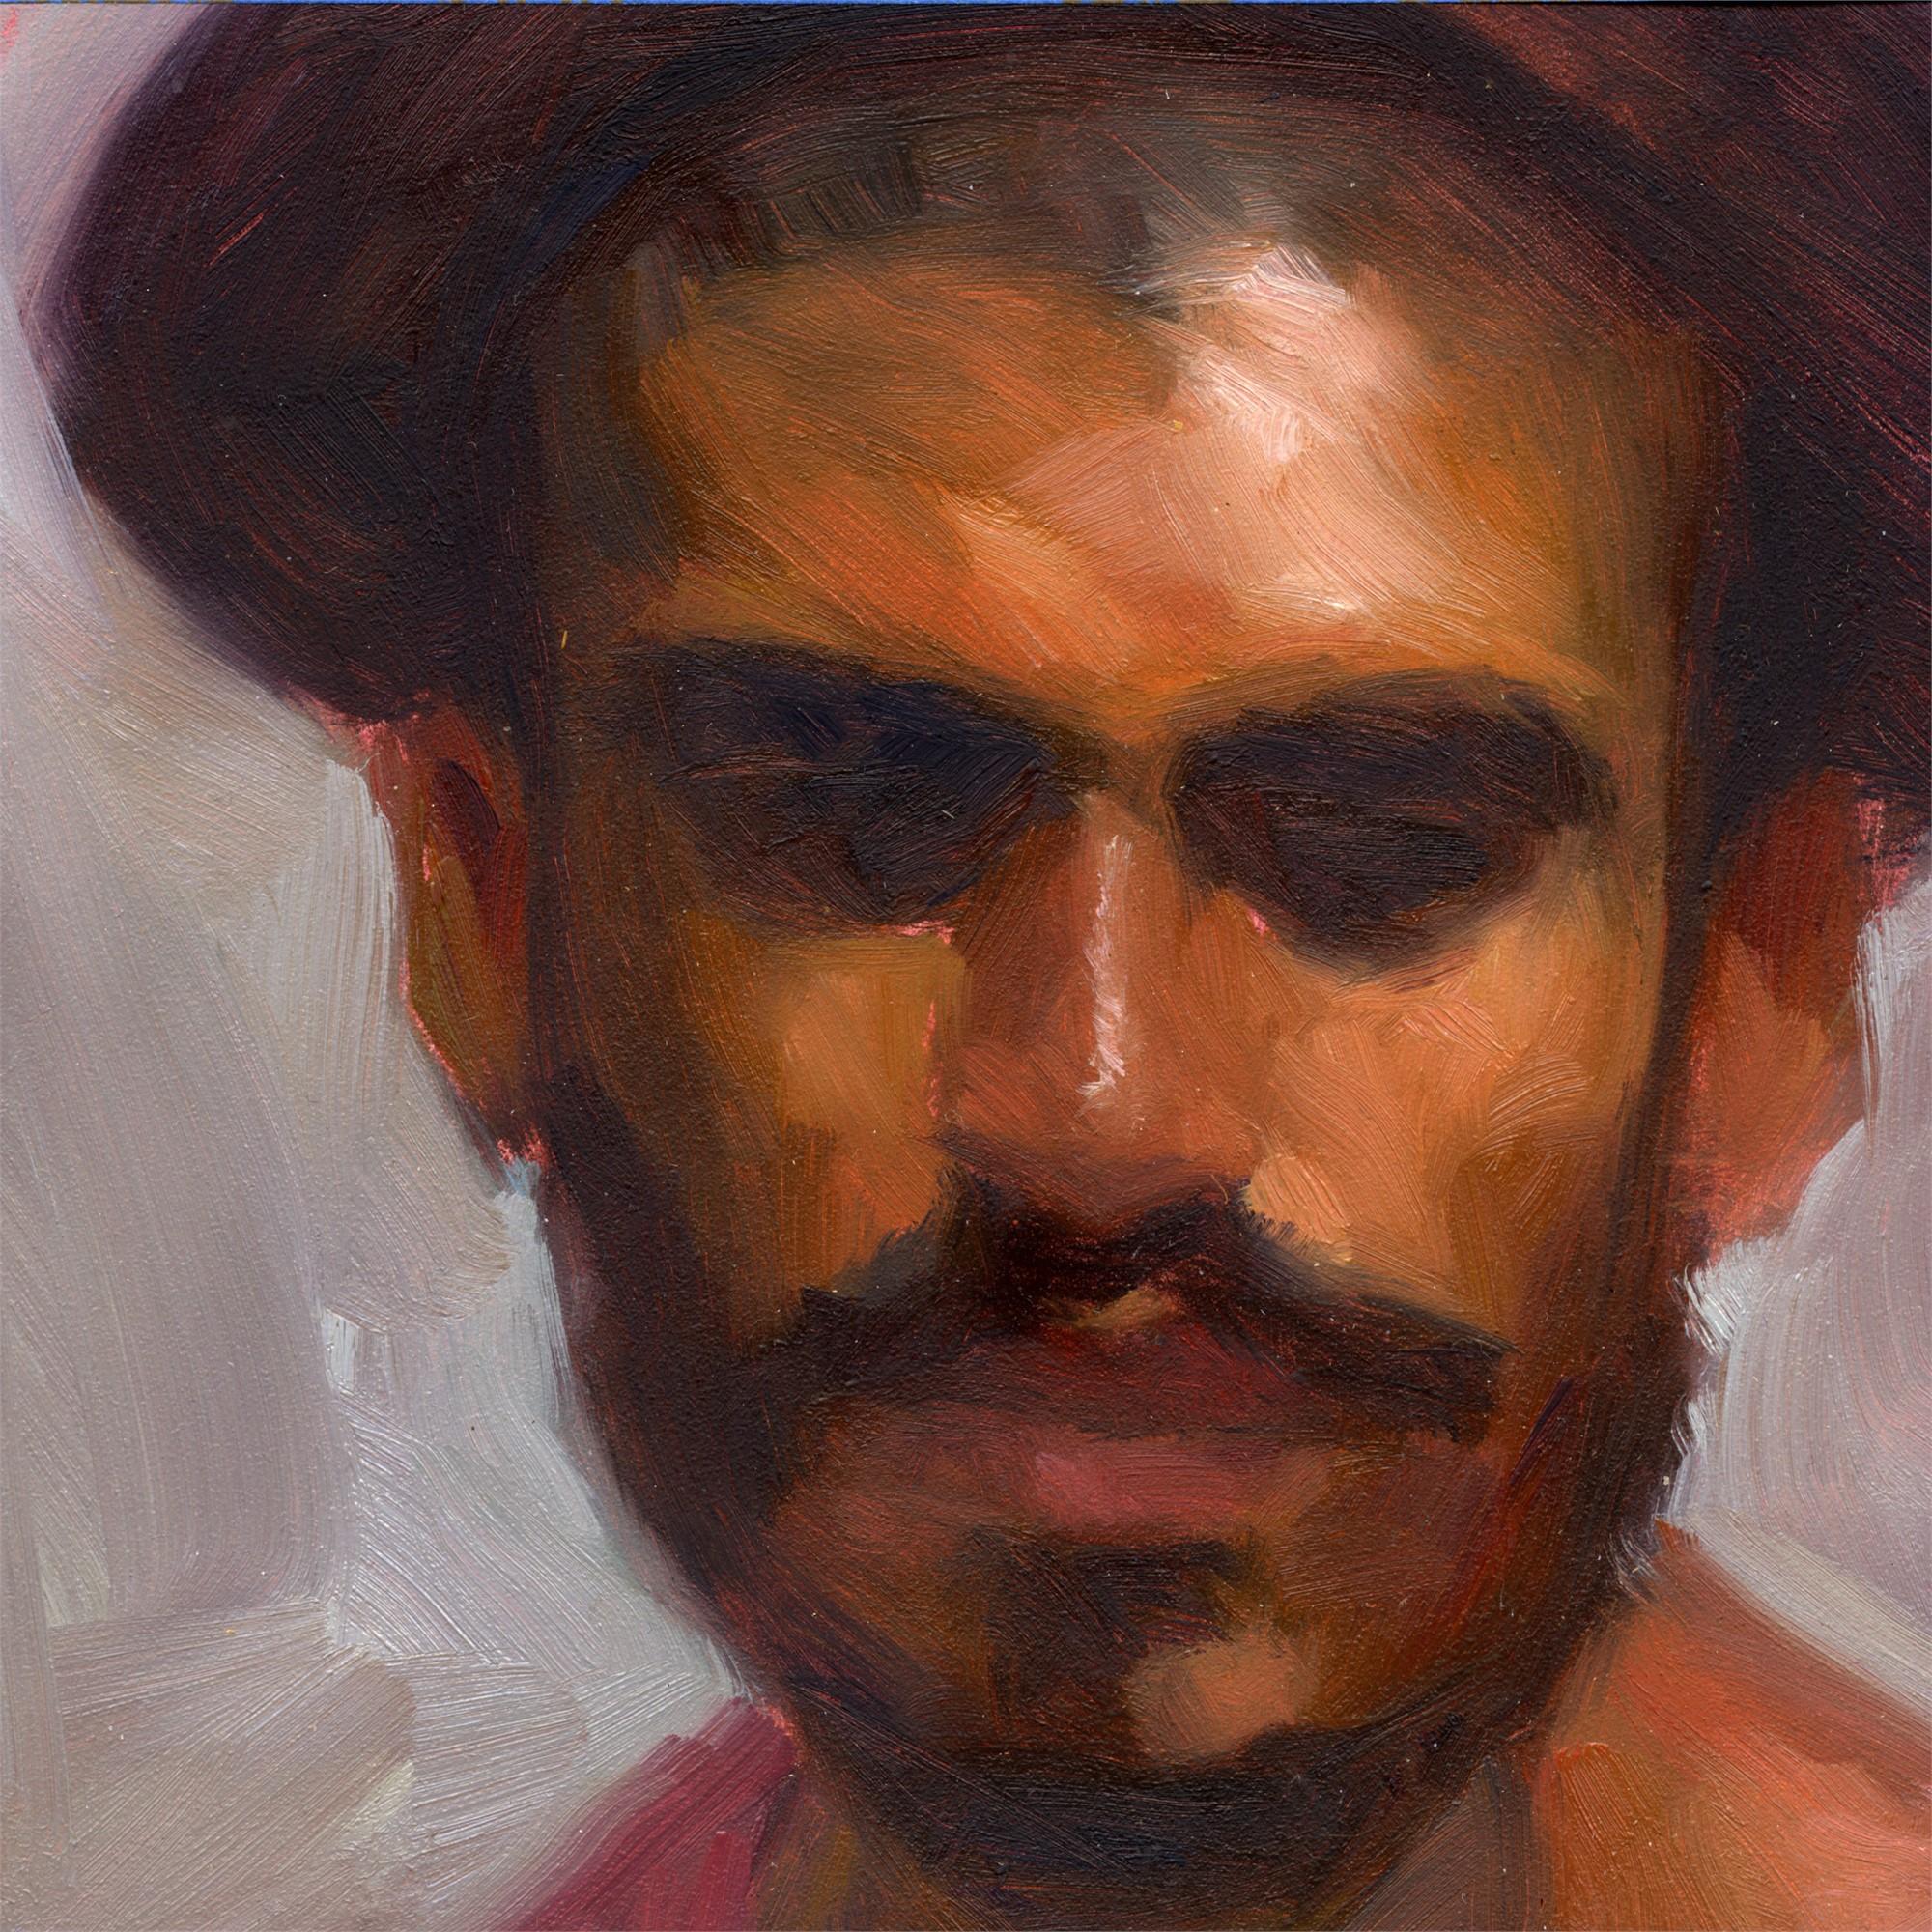 No. 6 by Ricardo Jose Mujica